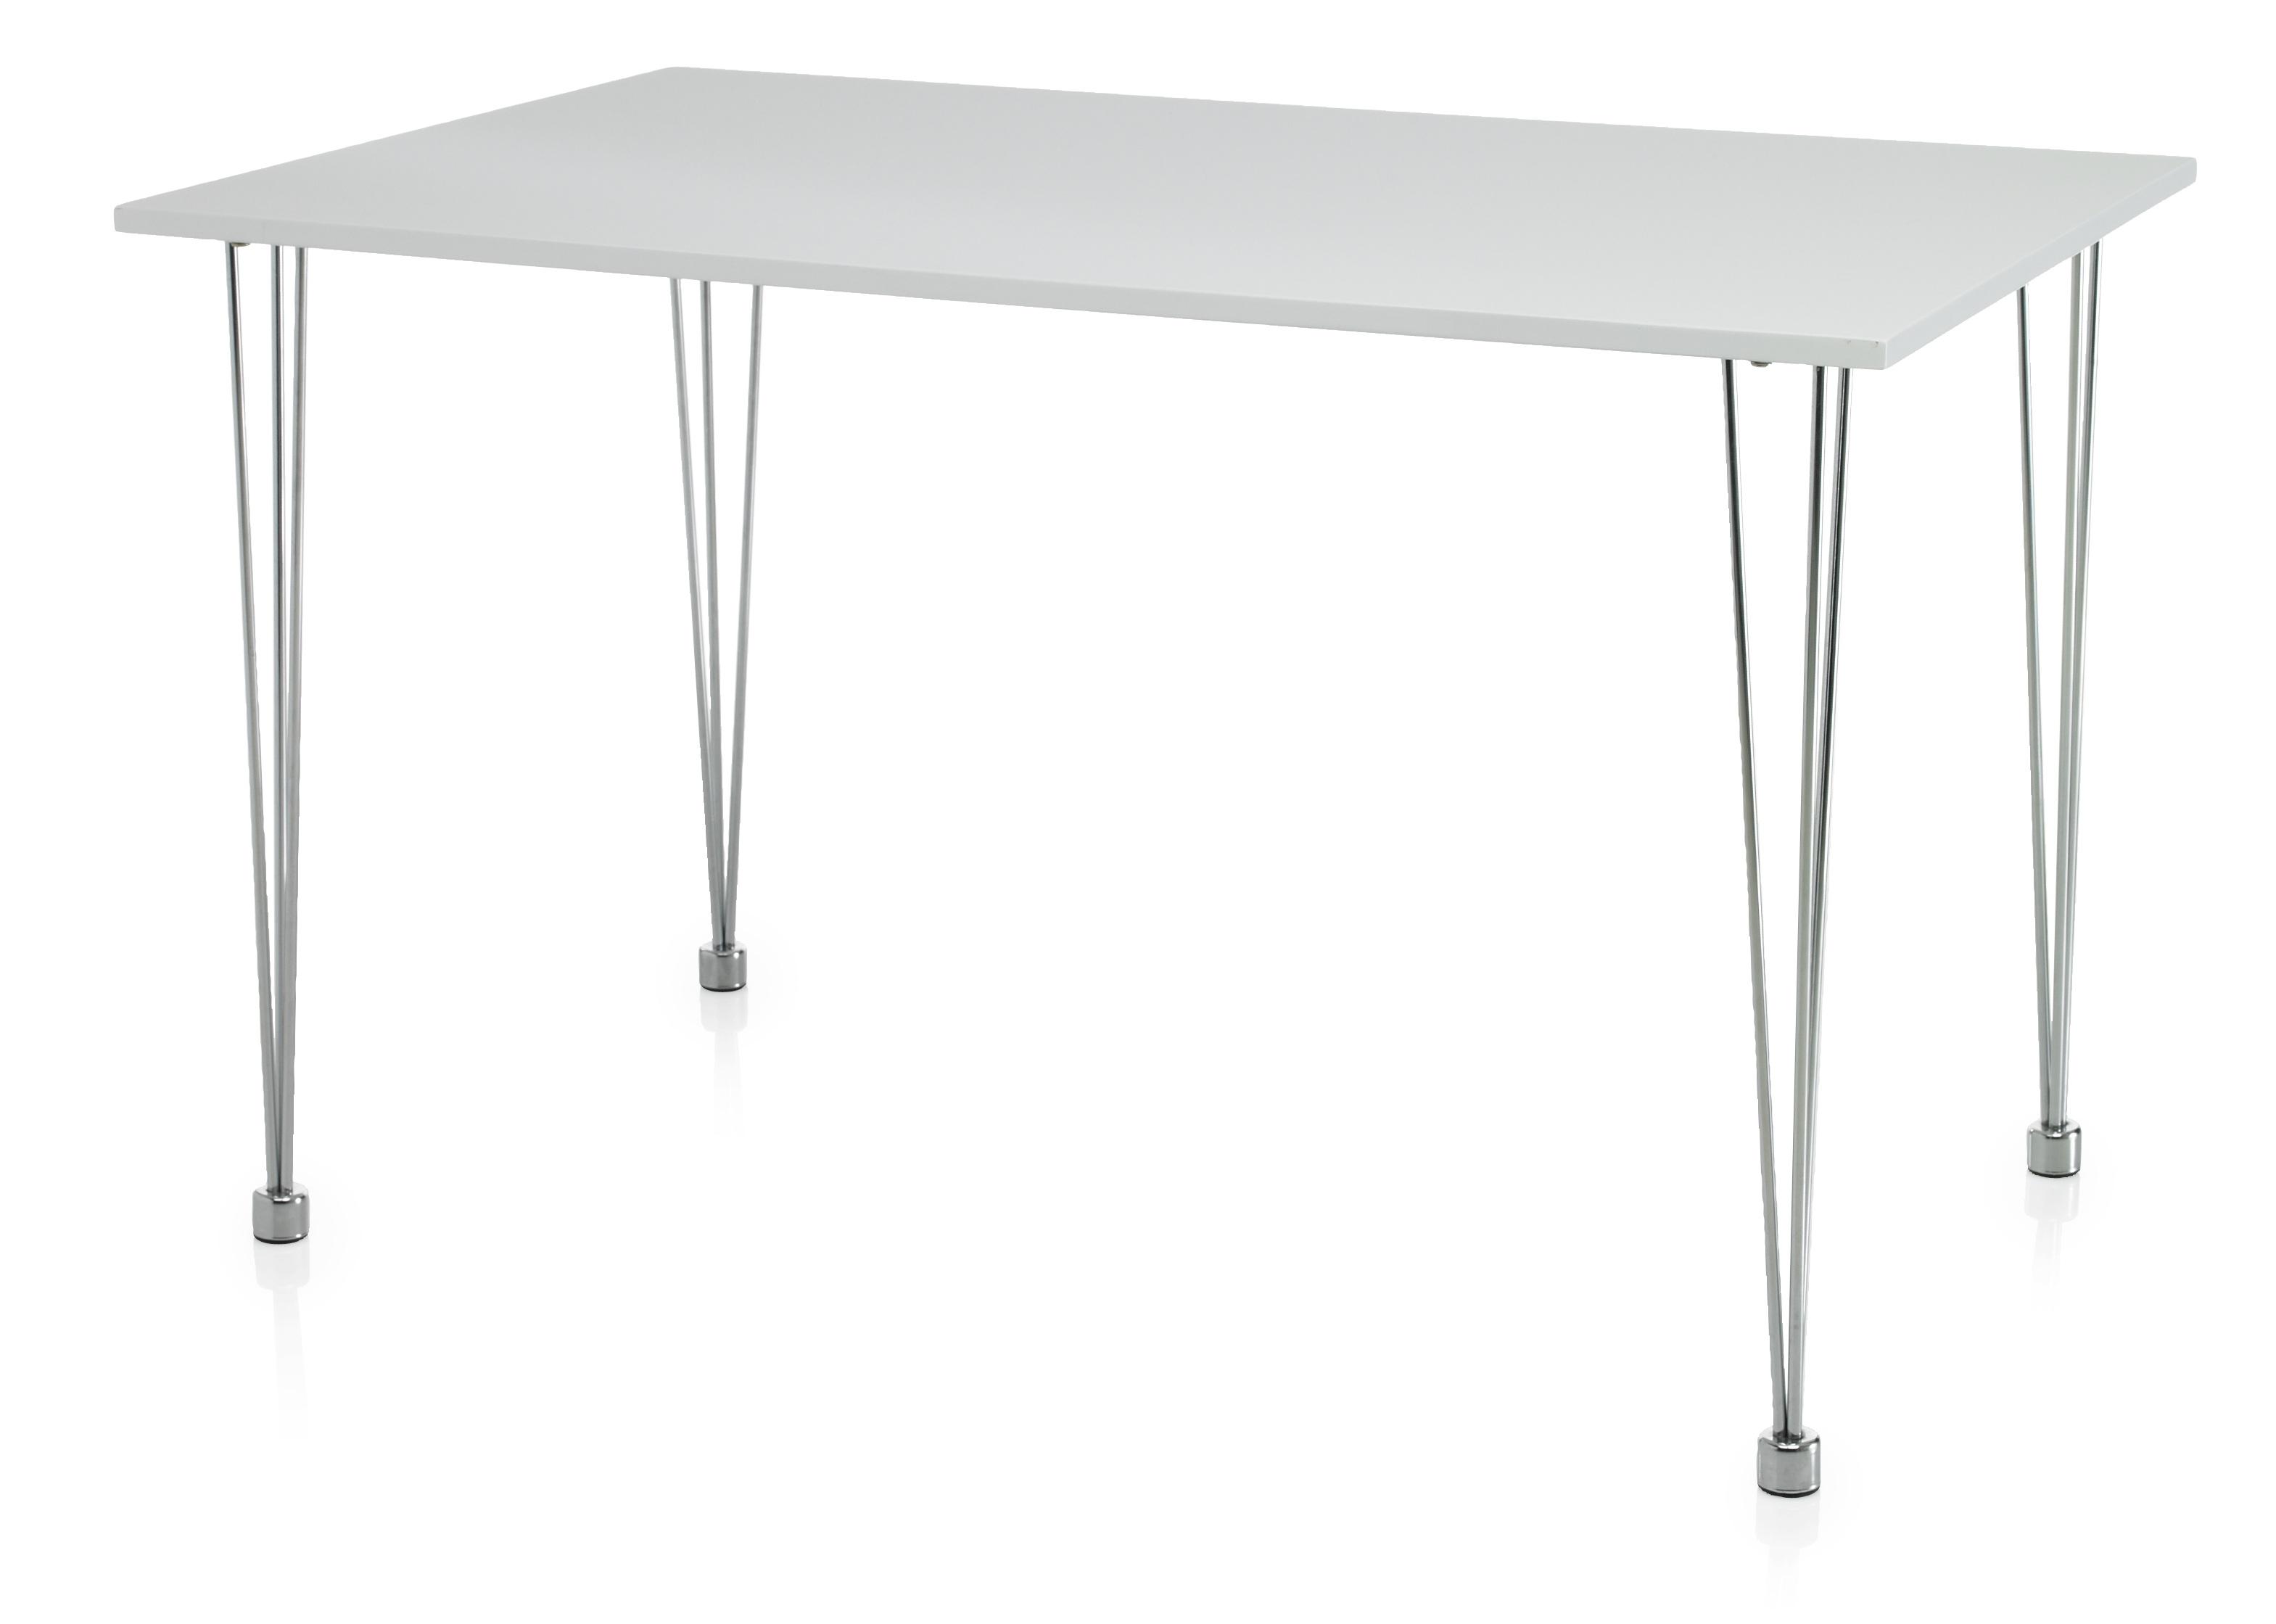 Hi Gloss Bistro Dining Table Rectangular White 6 Seater Kitchen Furniture EBay